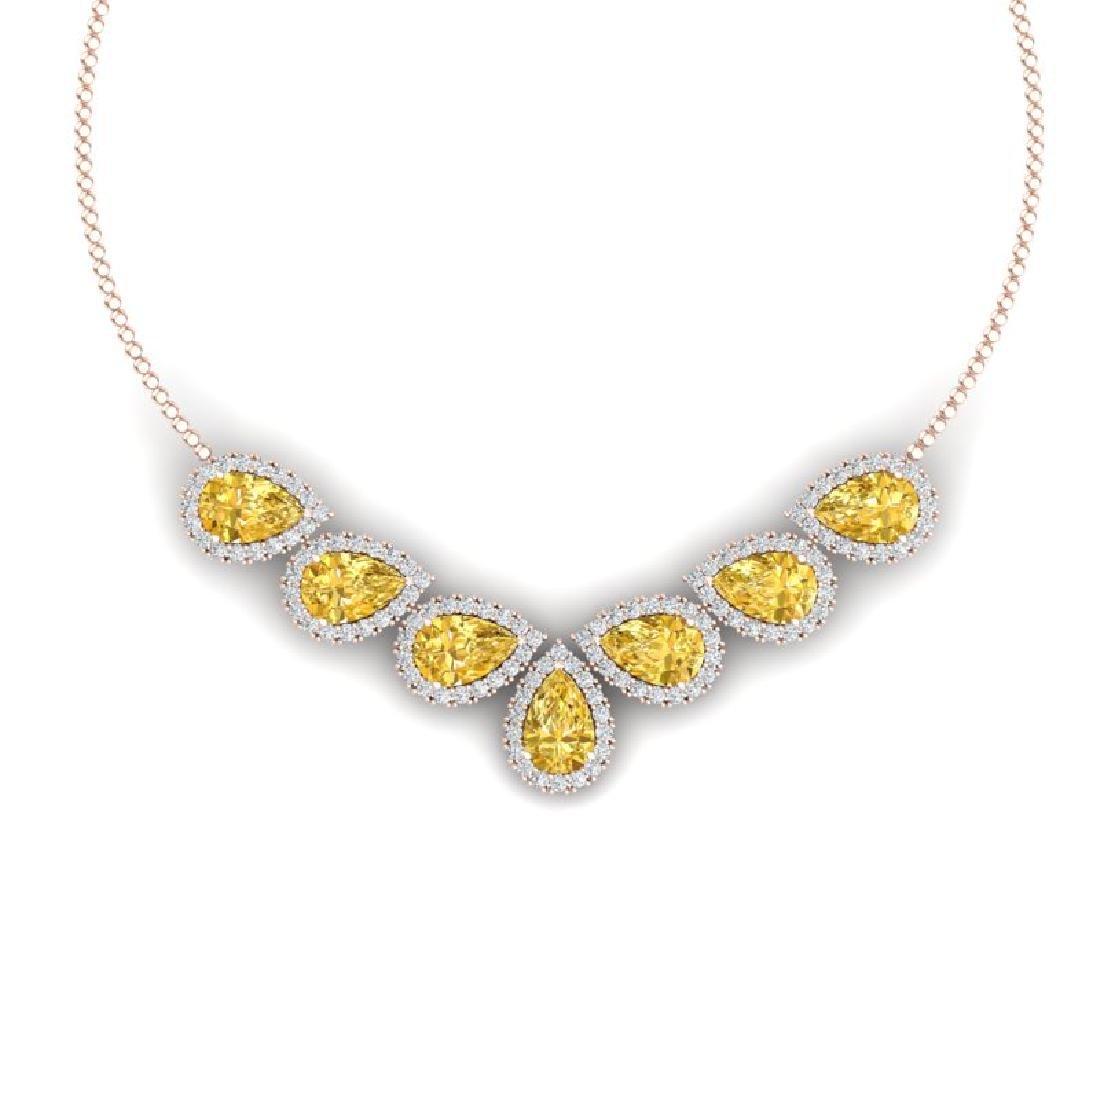 33.34 CTW Royalty Canary Citrine & VS Diamond Necklace